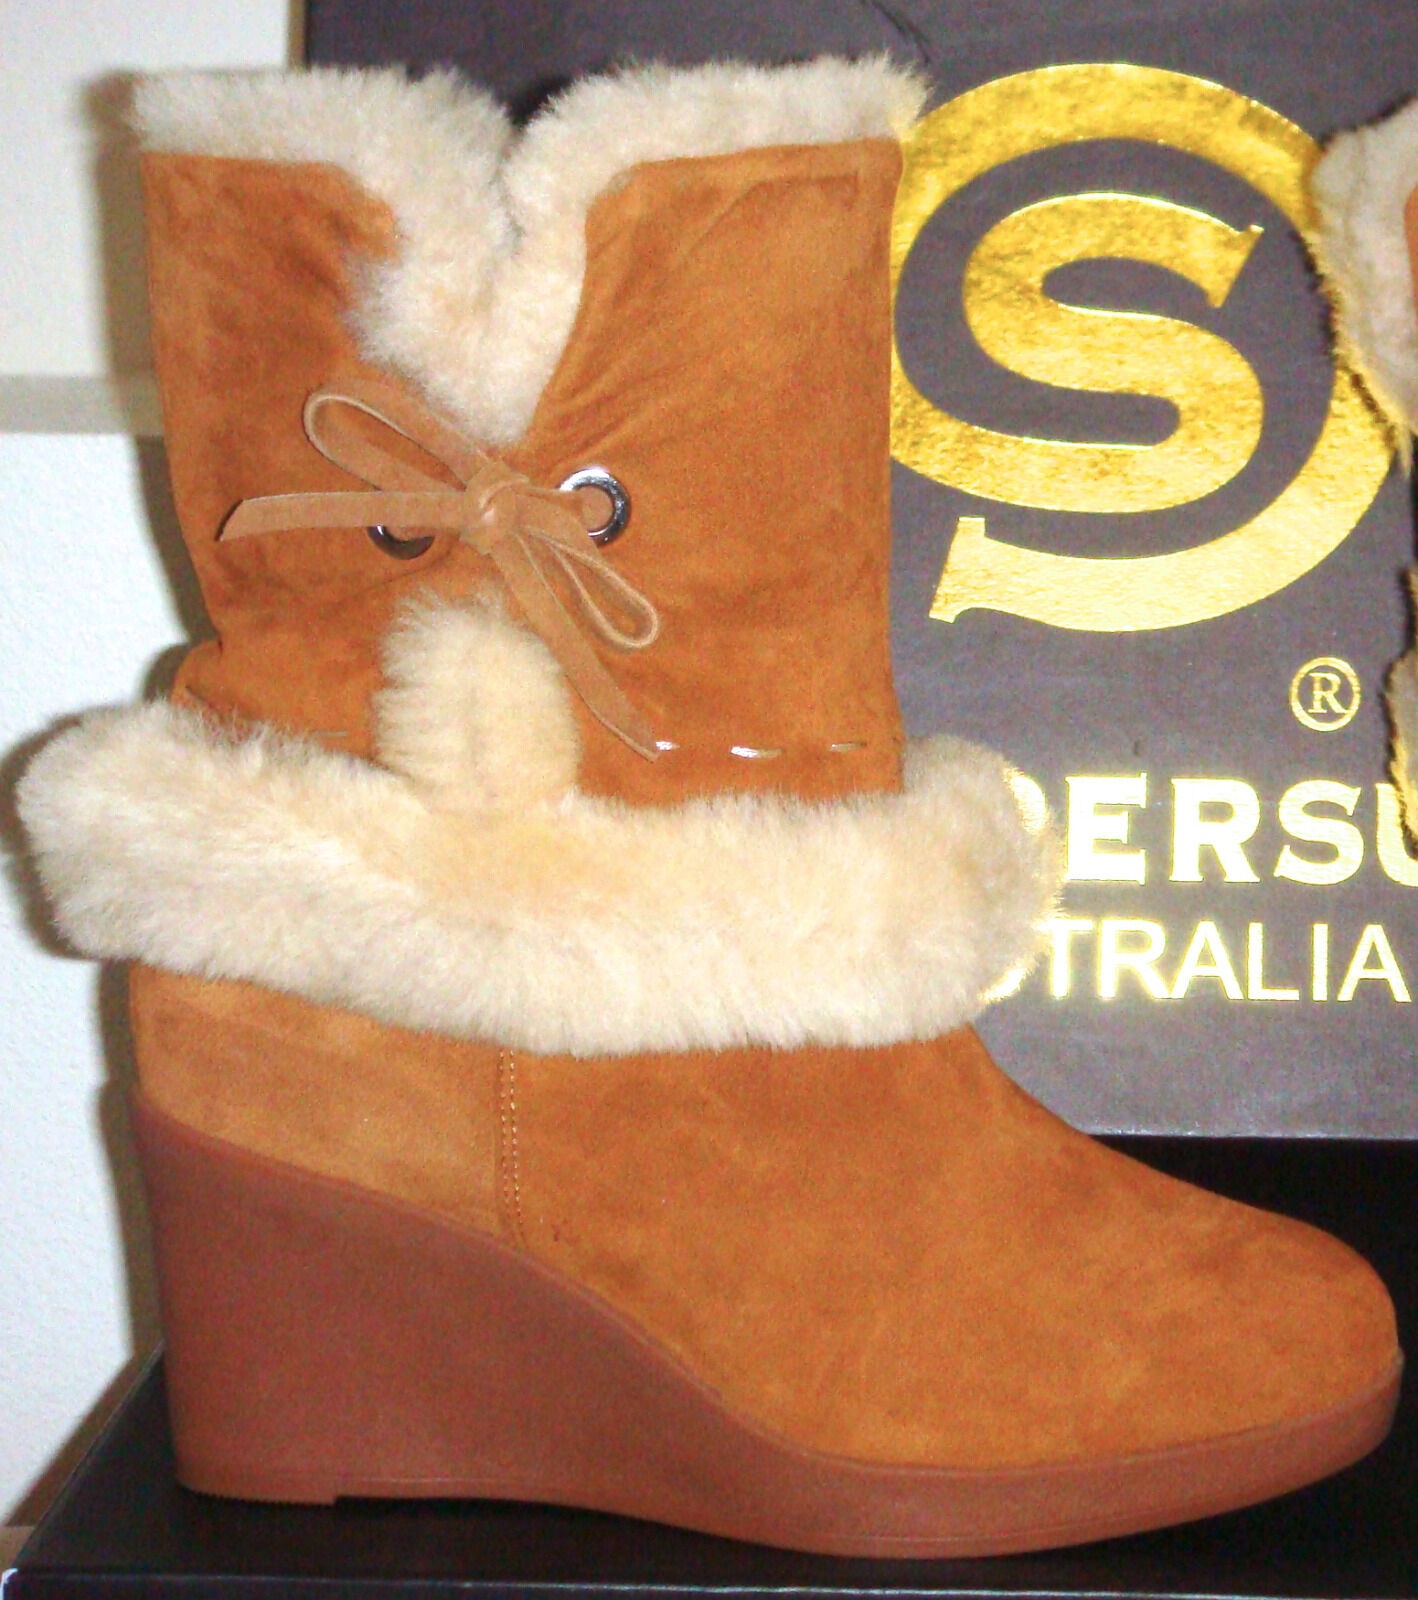 Shearers Ugg Original Boots Australia size 8 , Kelly Chestnut.